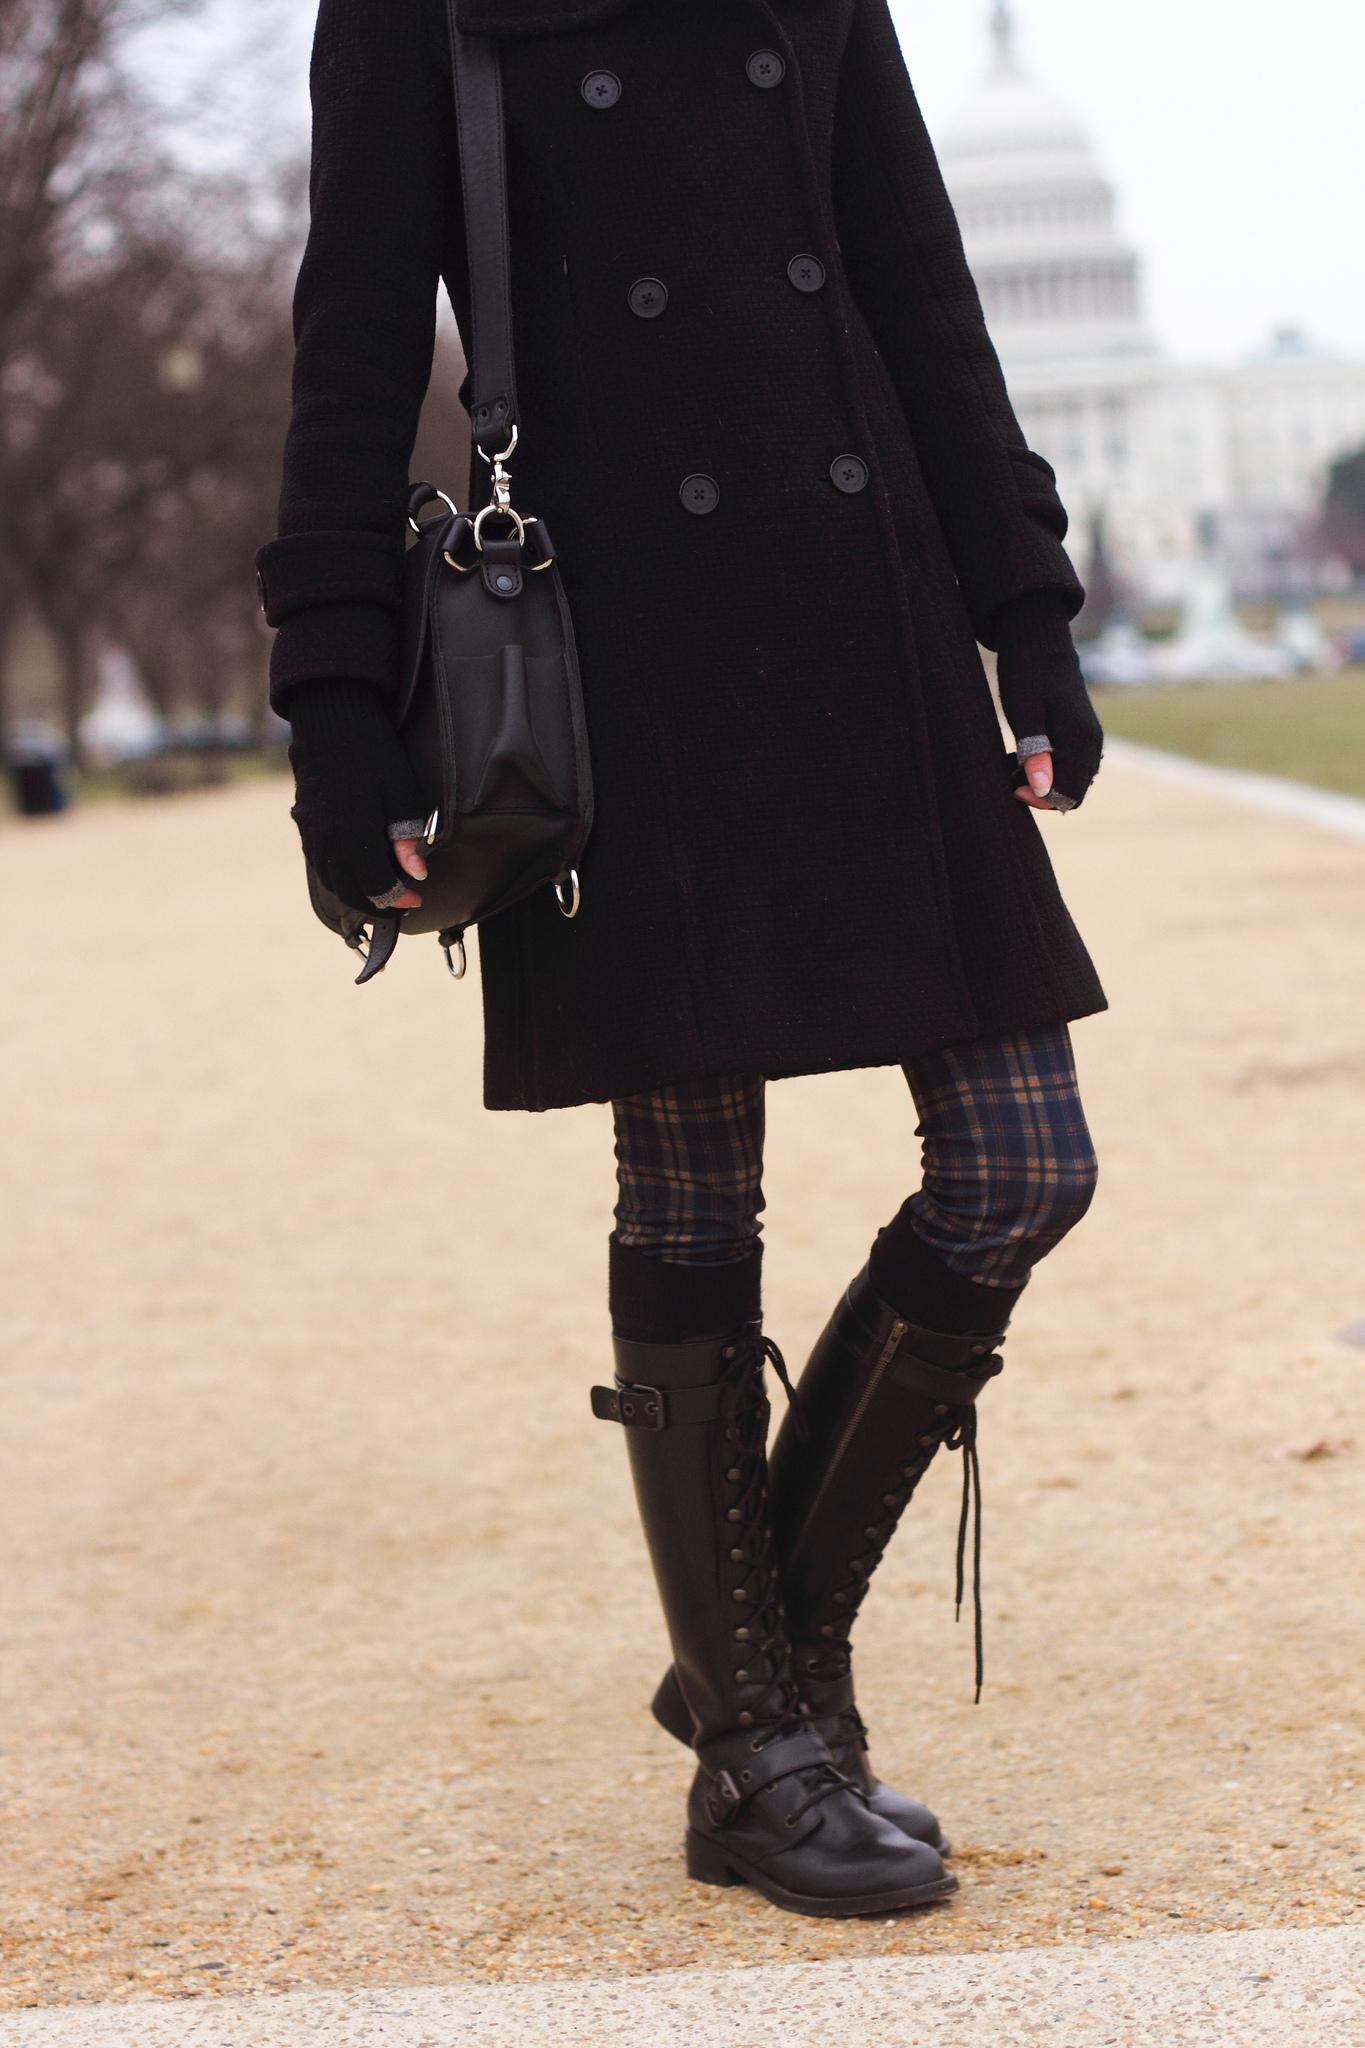 plaid pants and combat boots